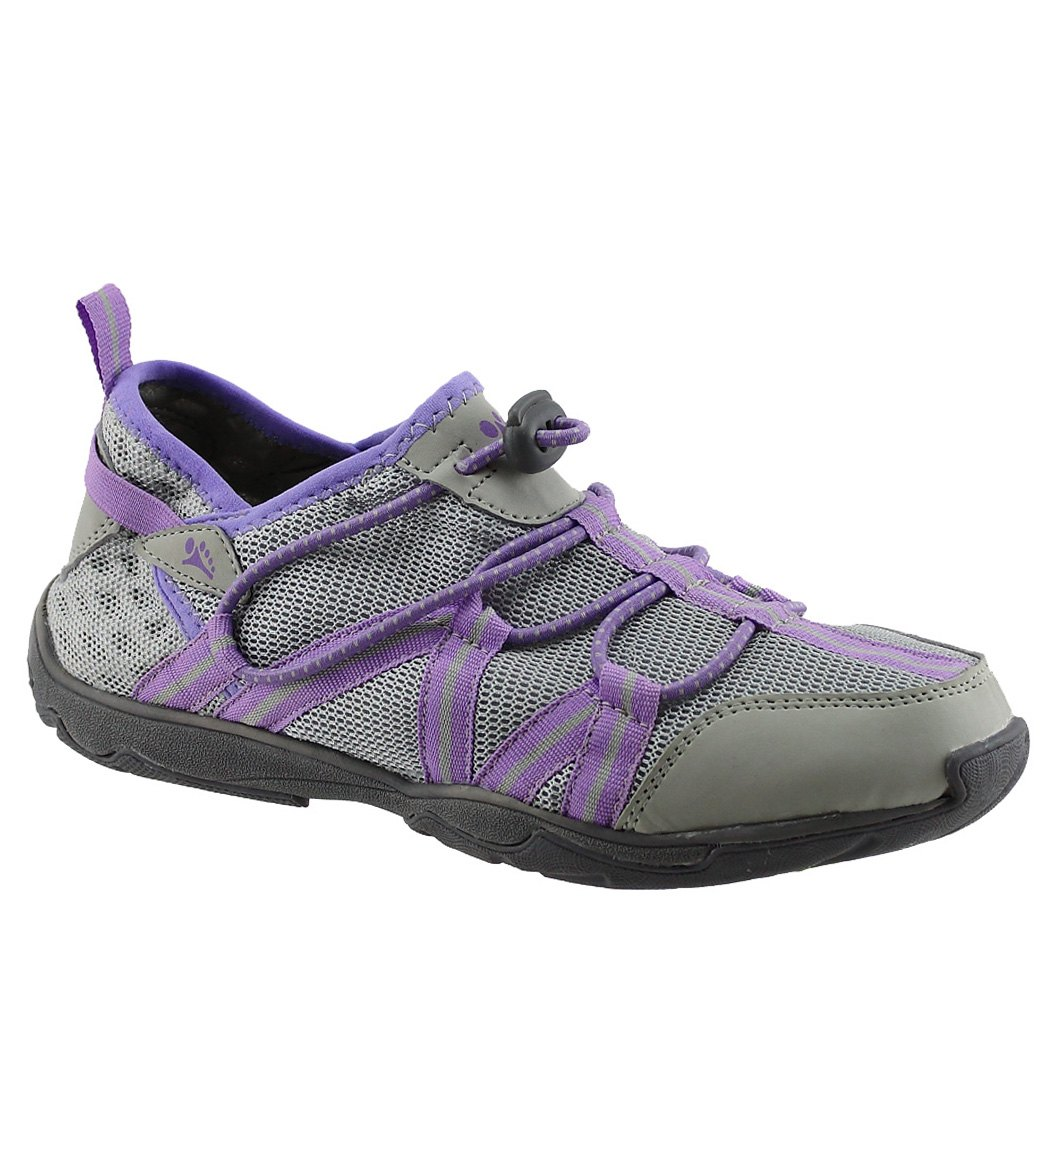 Cudas Tsunami 2 Water Shoe (Women's) 3JKDvY